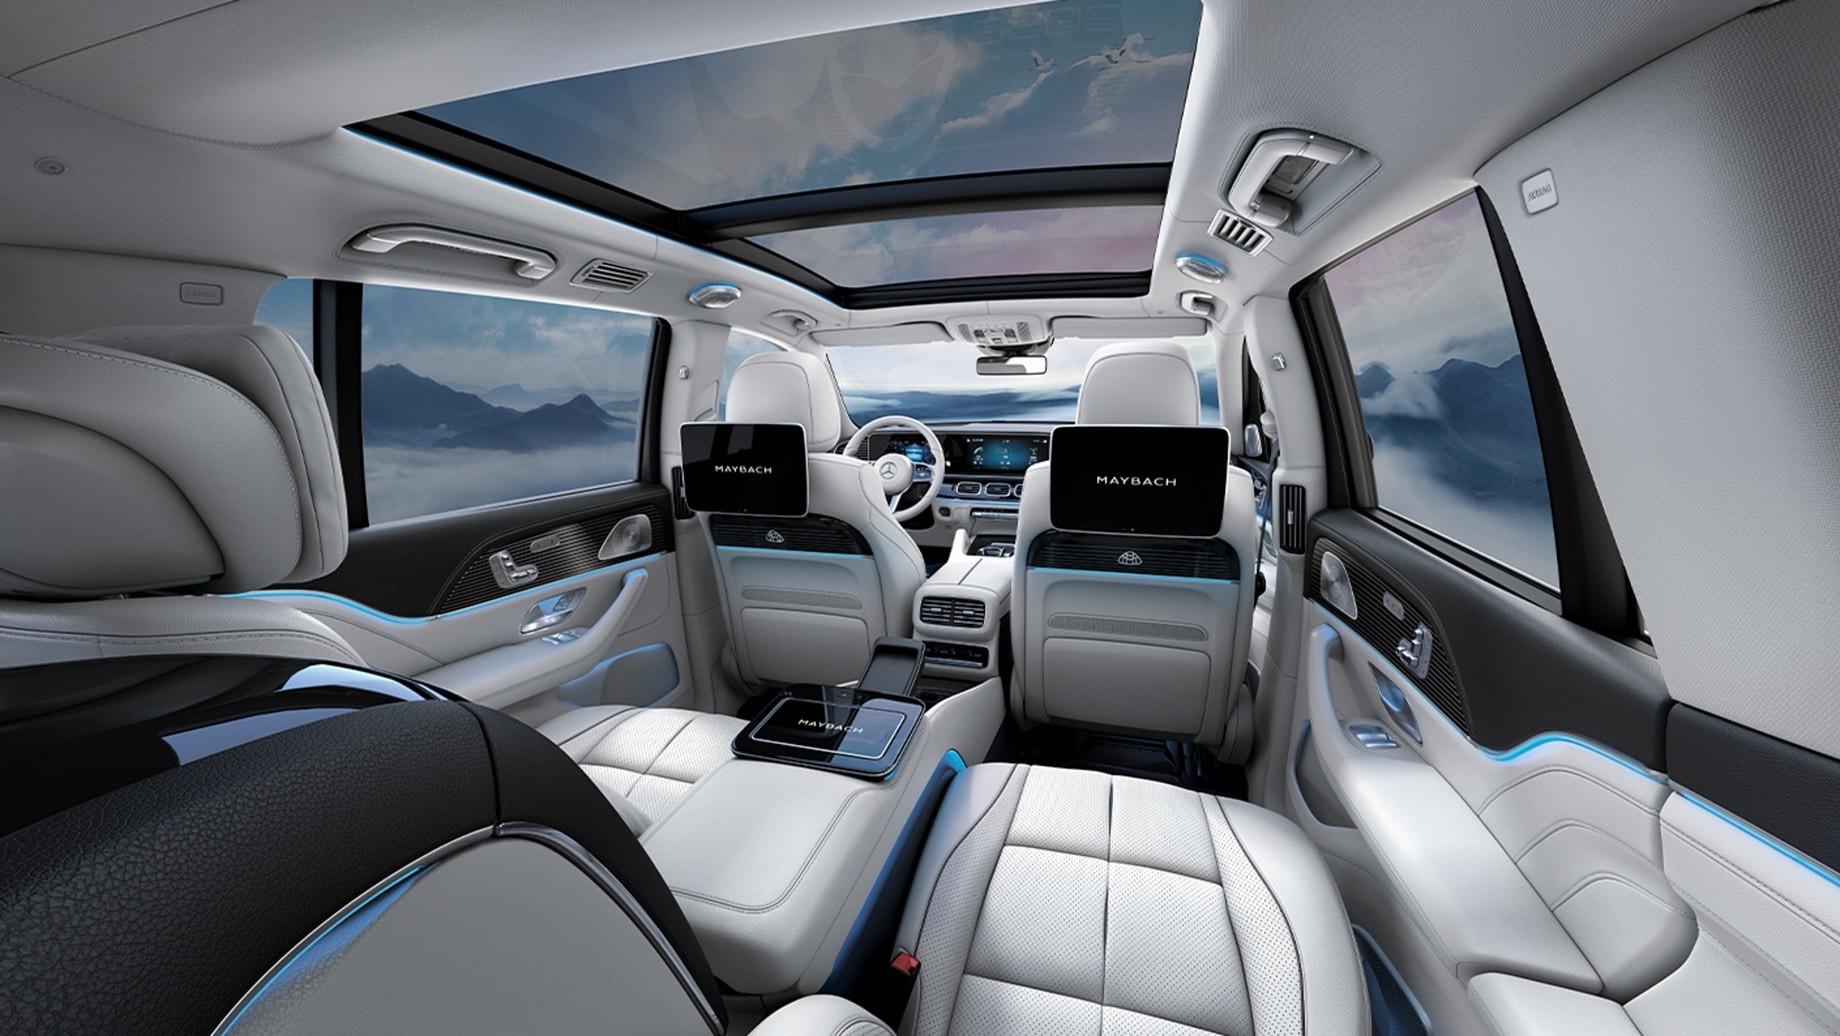 Mercedes представил новый Maybach GLS с шестицилиндровым мотором